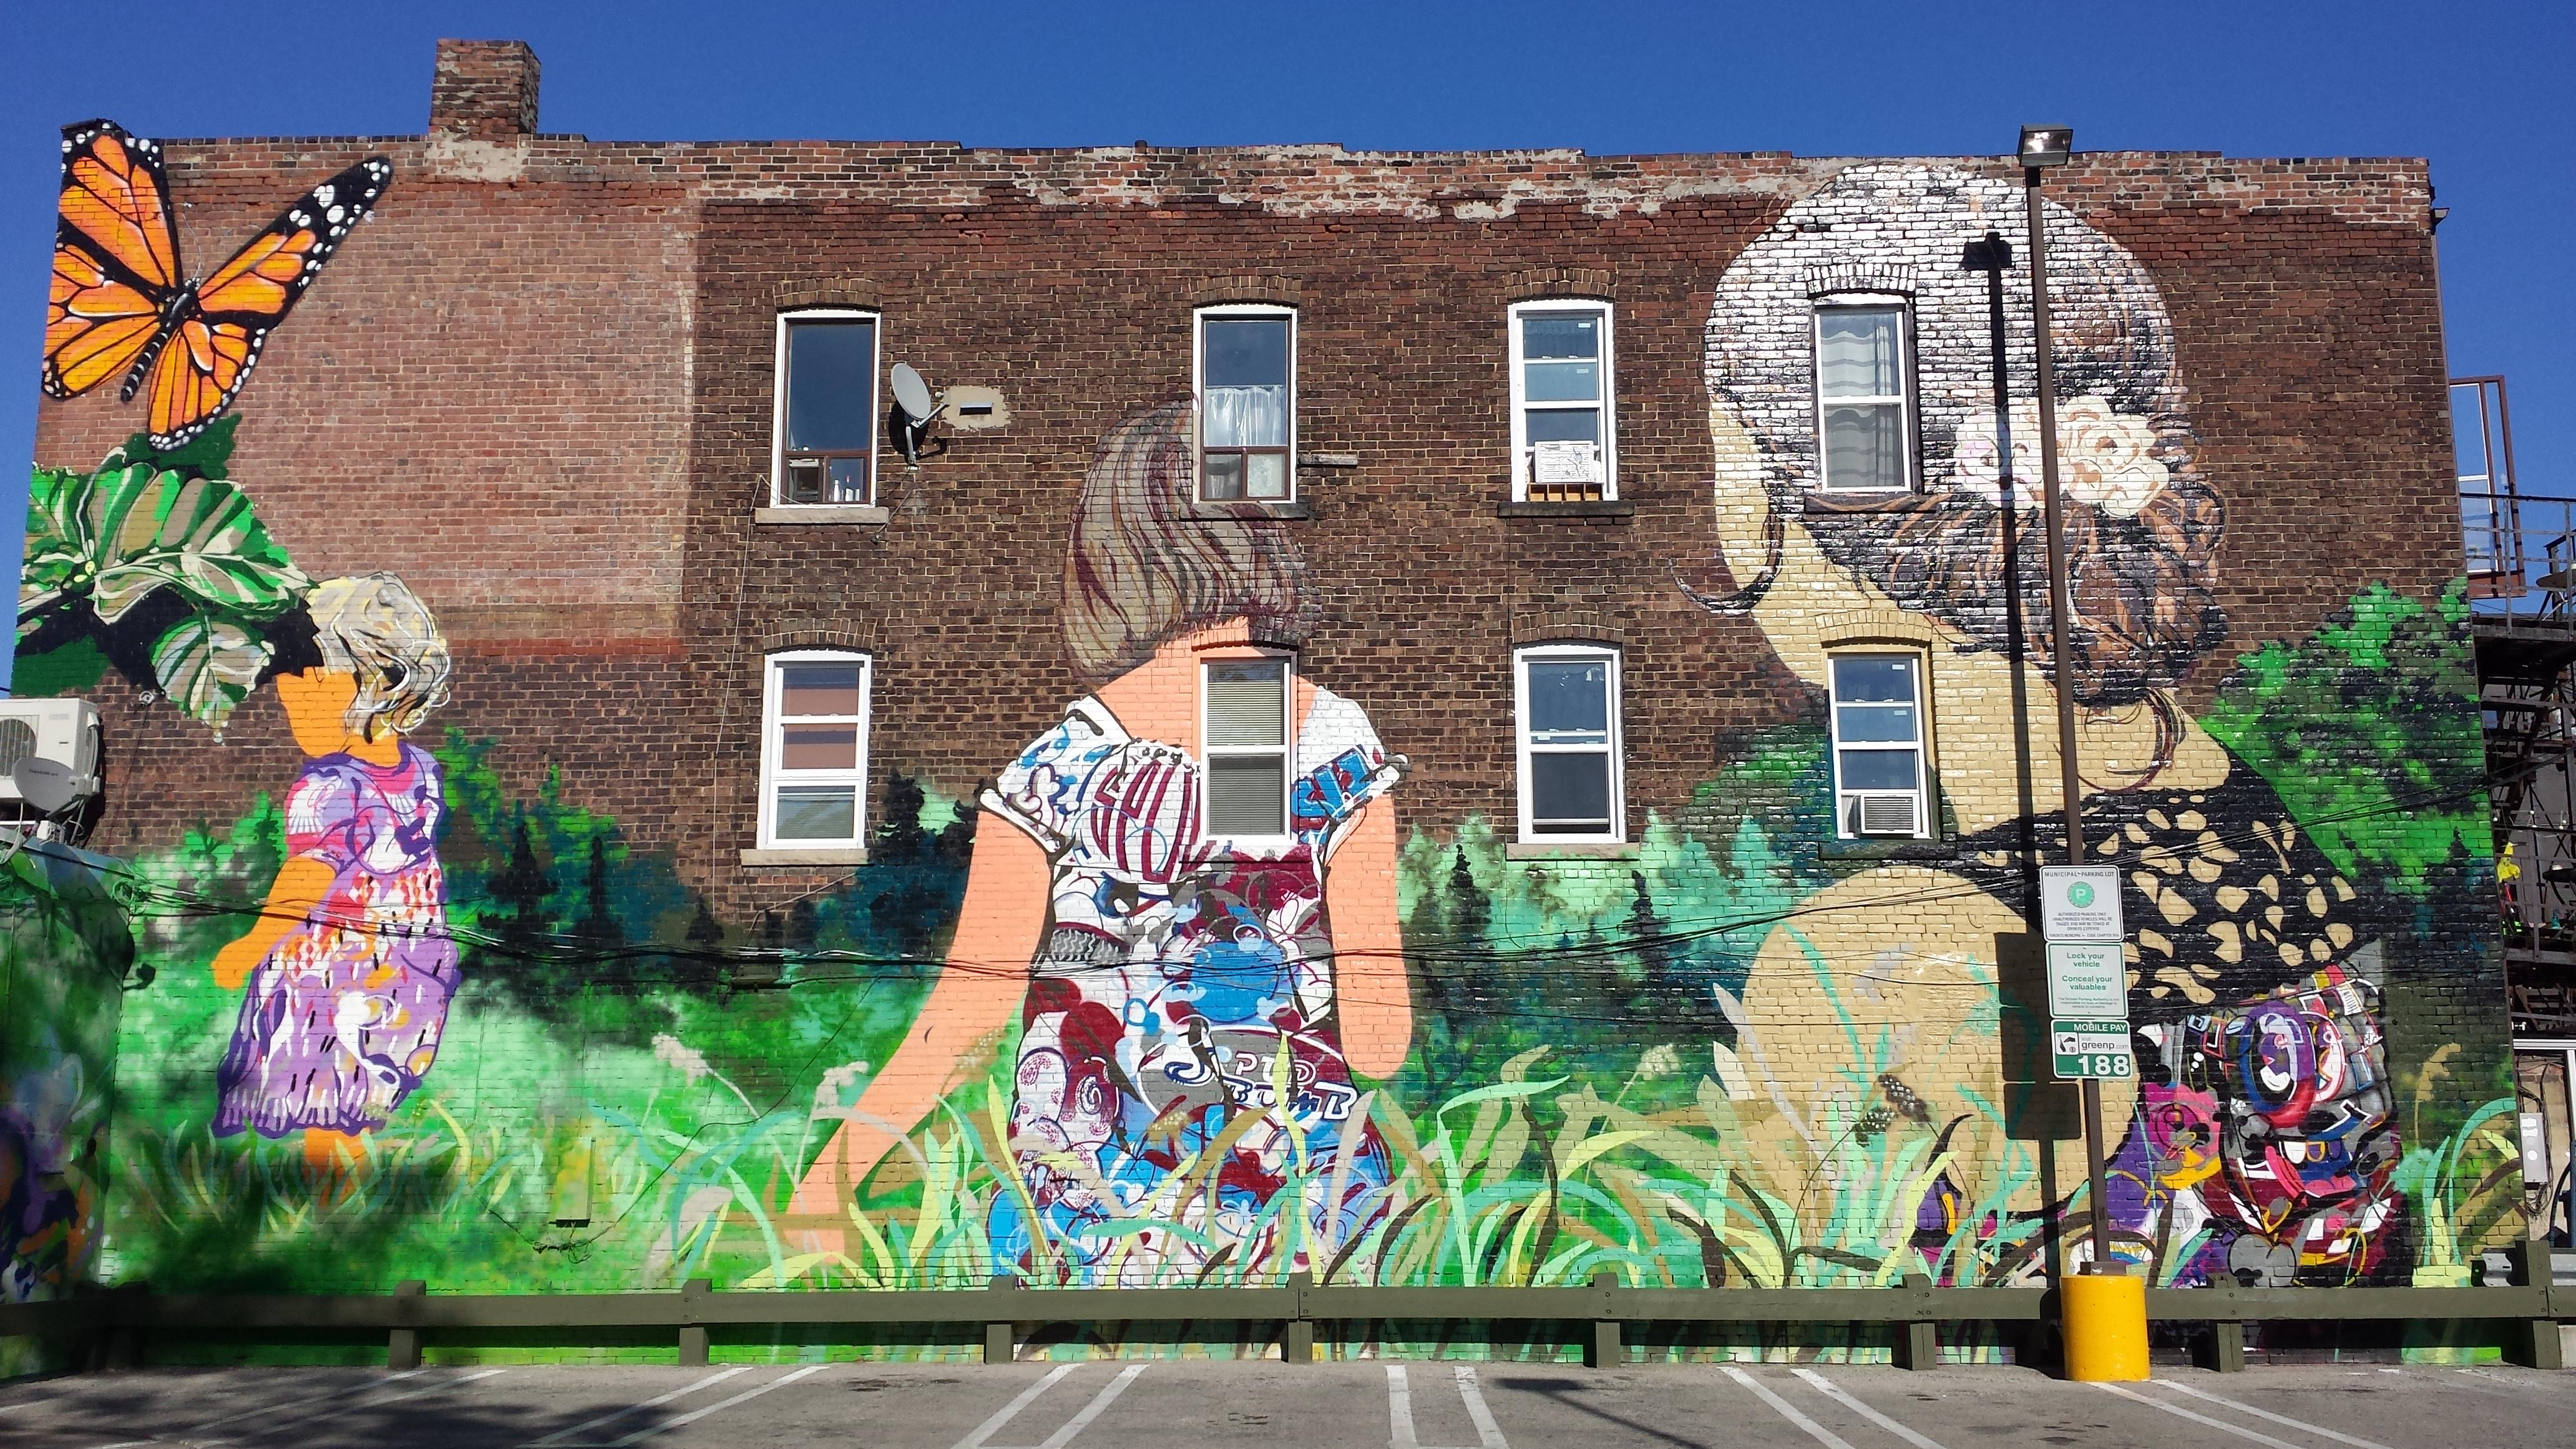 Graffiti management